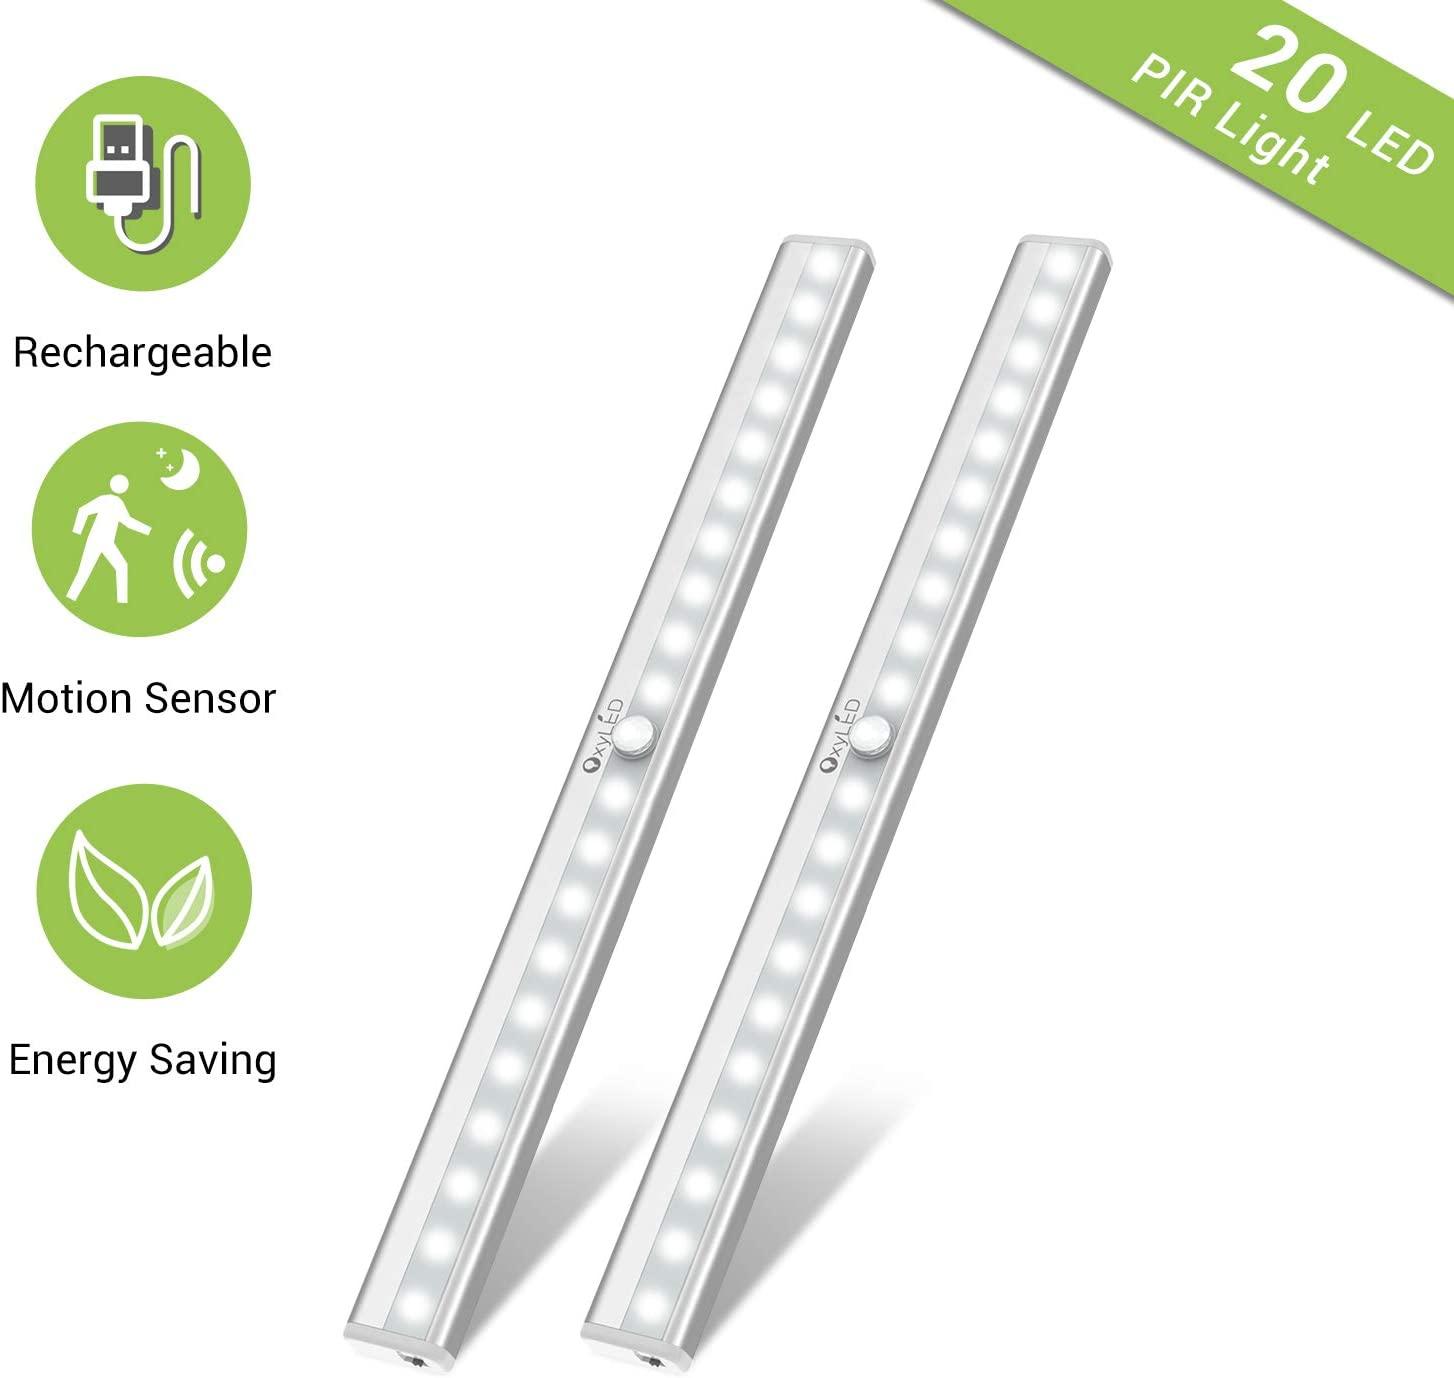 Under Cabinet Lighting, Motion Sensor Closet Lights OxyLED 20 LED USB Rechargeable Under Cabinet Lights Wireless Under Counter Lighting, Motion Led Light Bar for Closet, Cabinet (T-02S, 2 Pack)